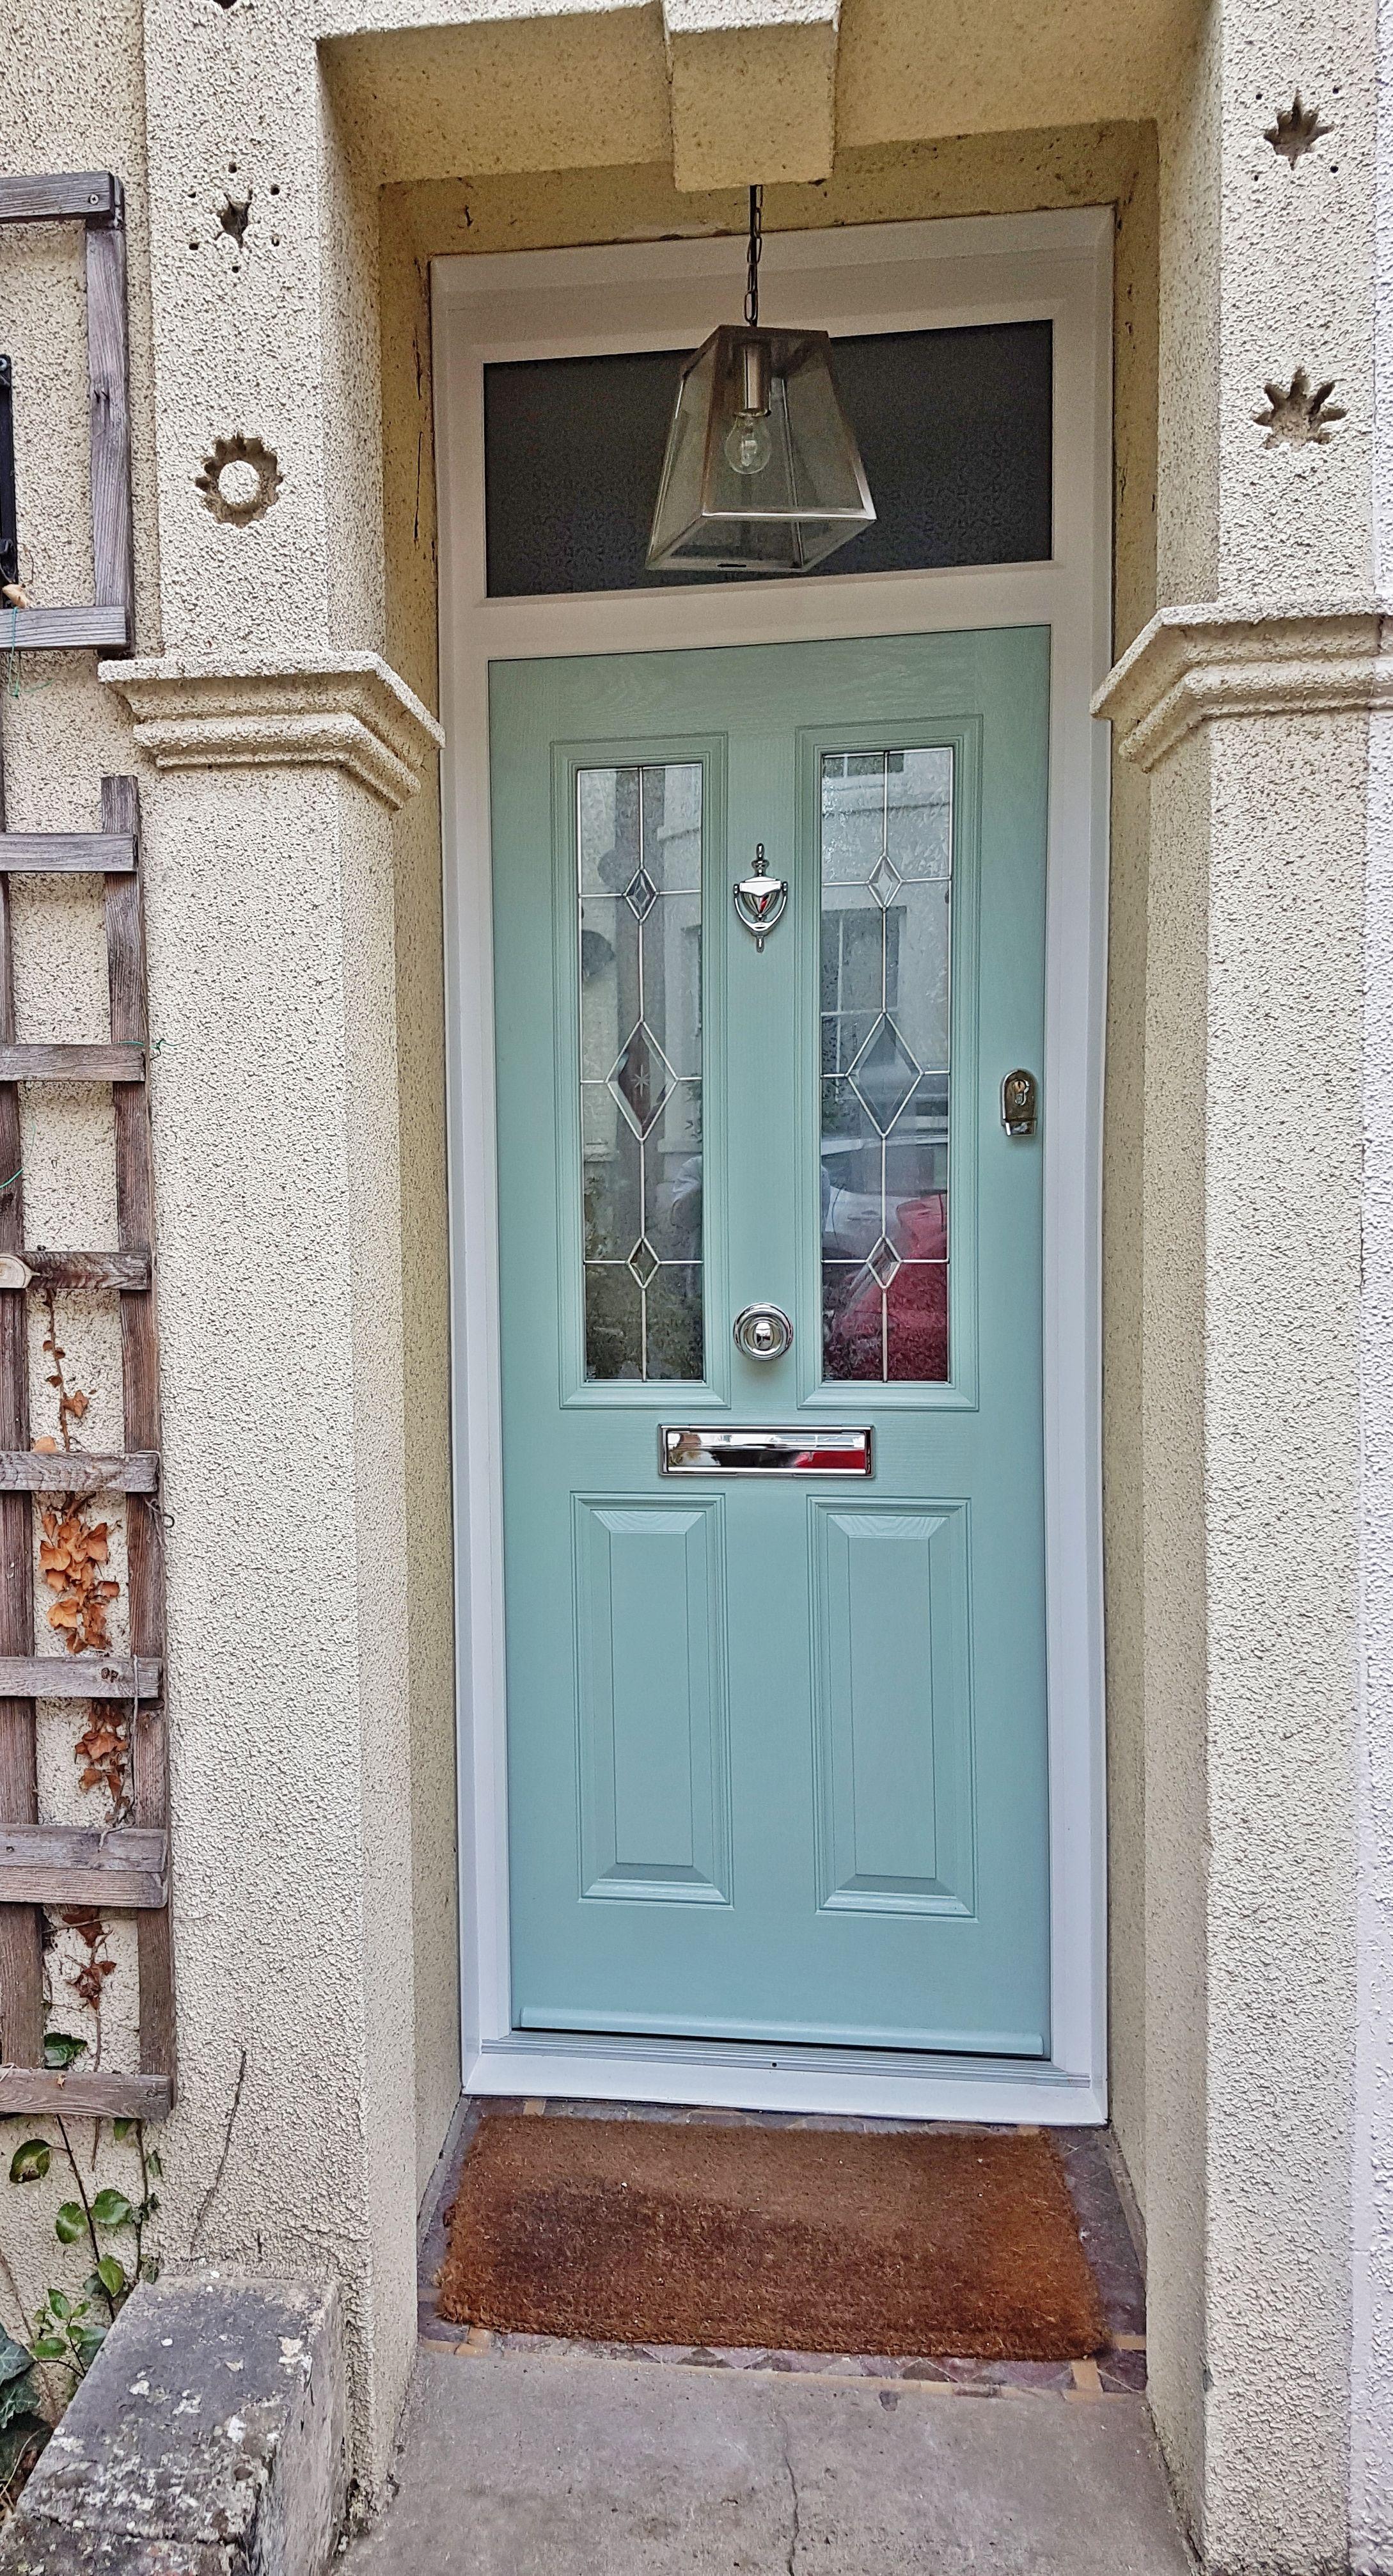 Duck Egg Blue Composite Front Entrance Door With Overhead